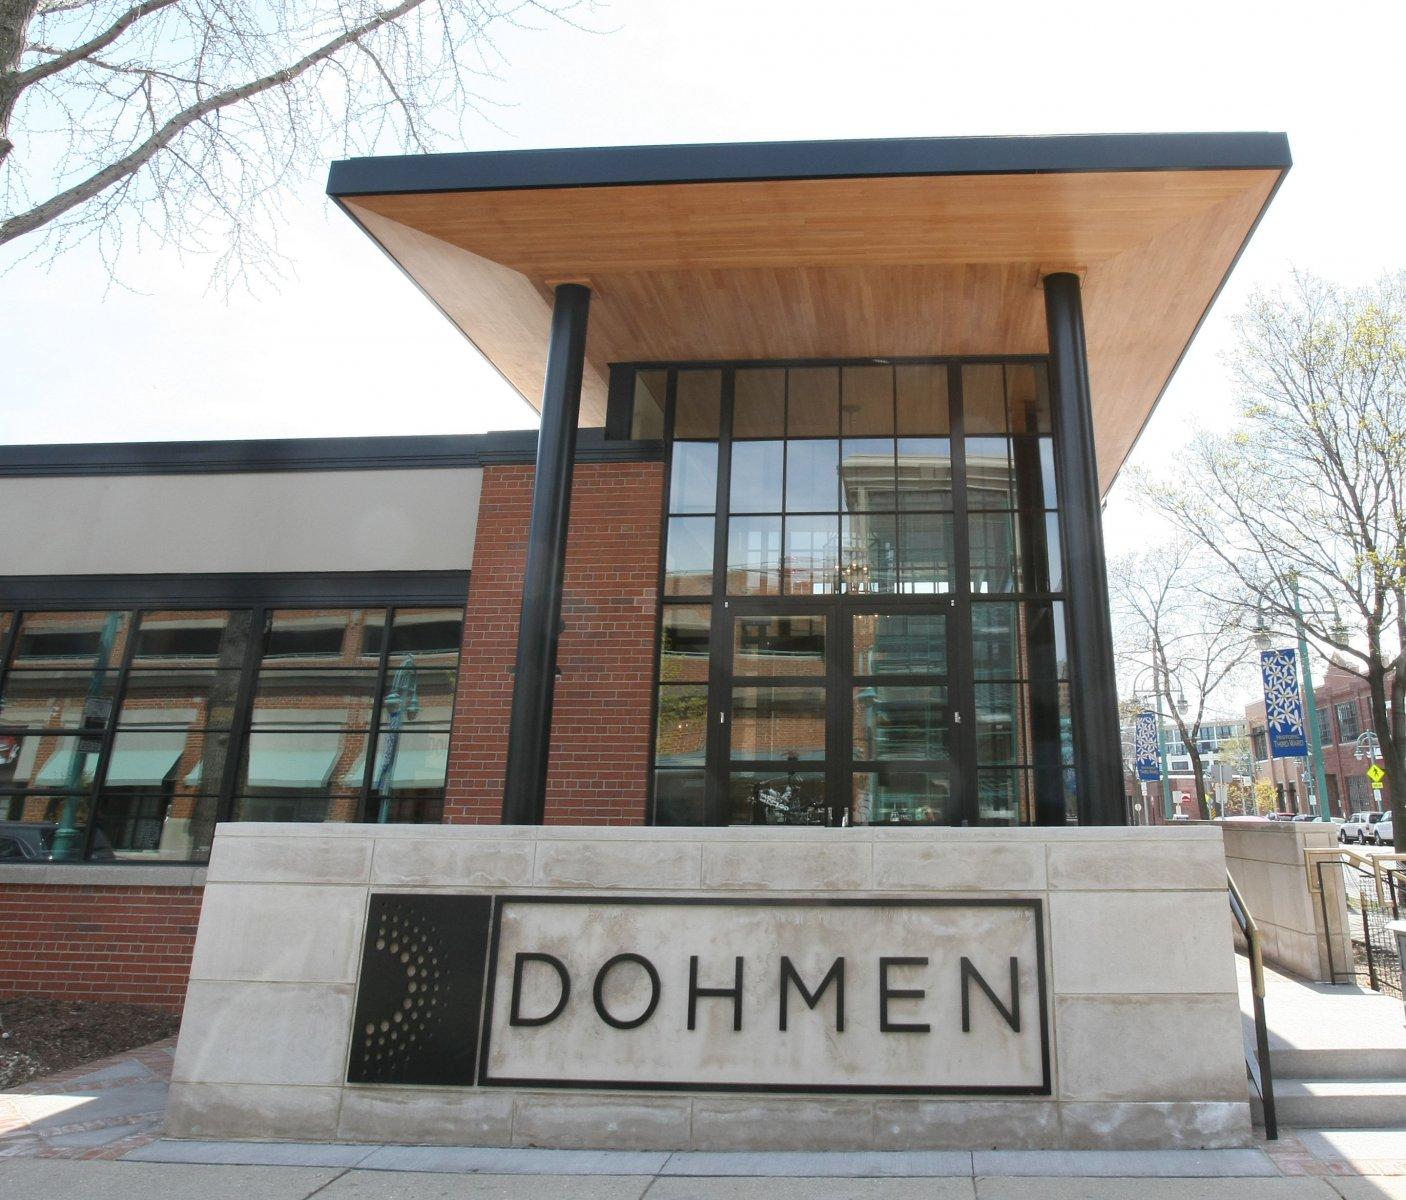 Dohmen's Headquarters